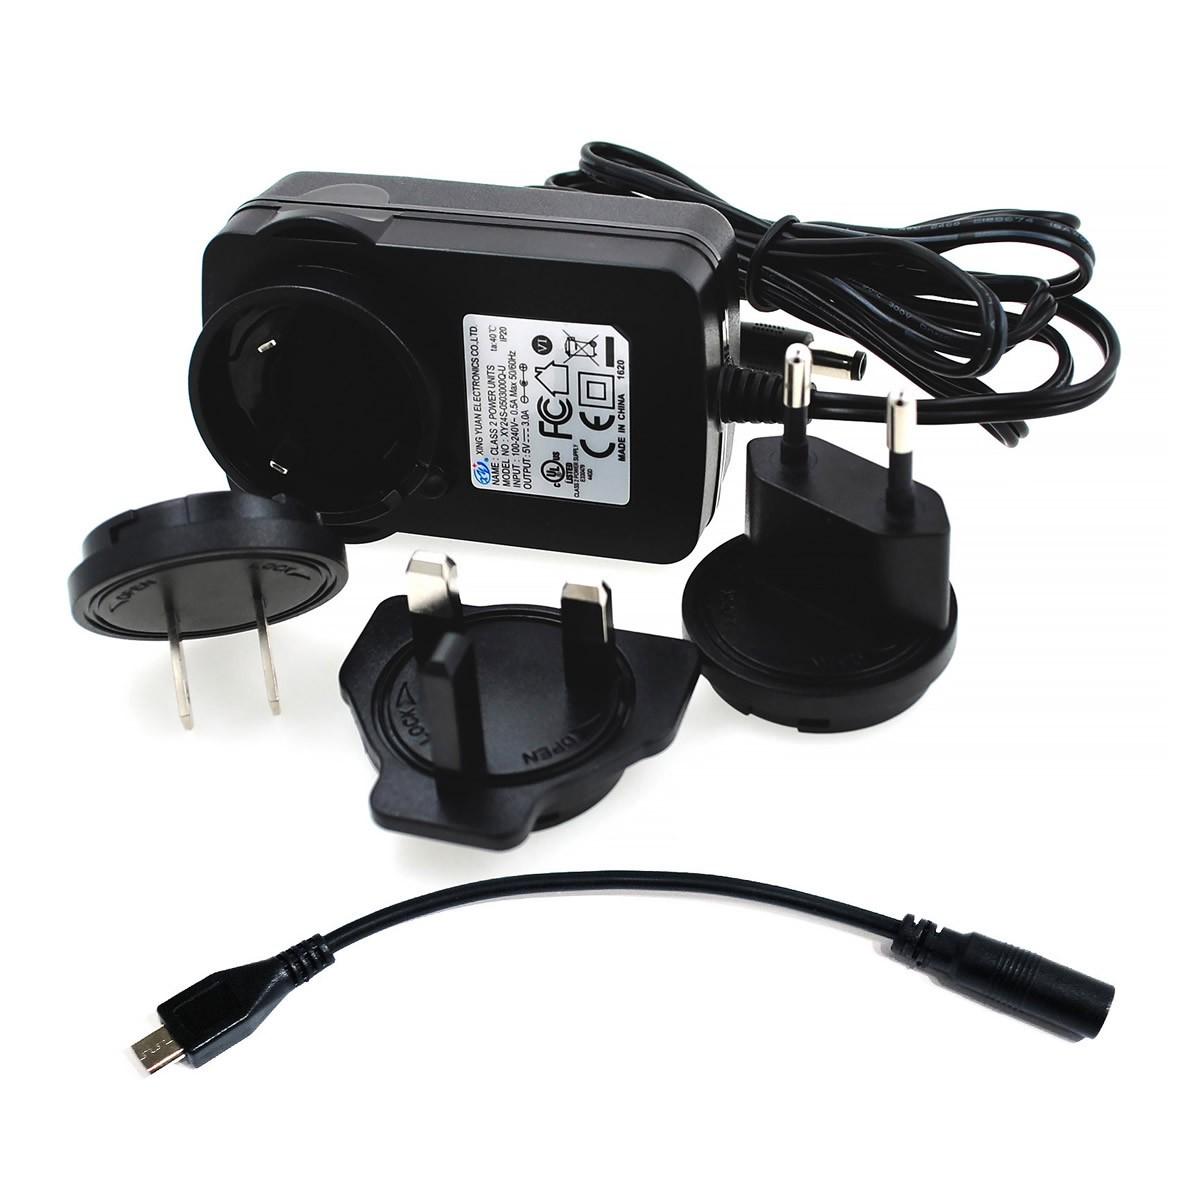 ALLO Adaptateur Secteur Alimentation 5V / 3A DC + Micro USB